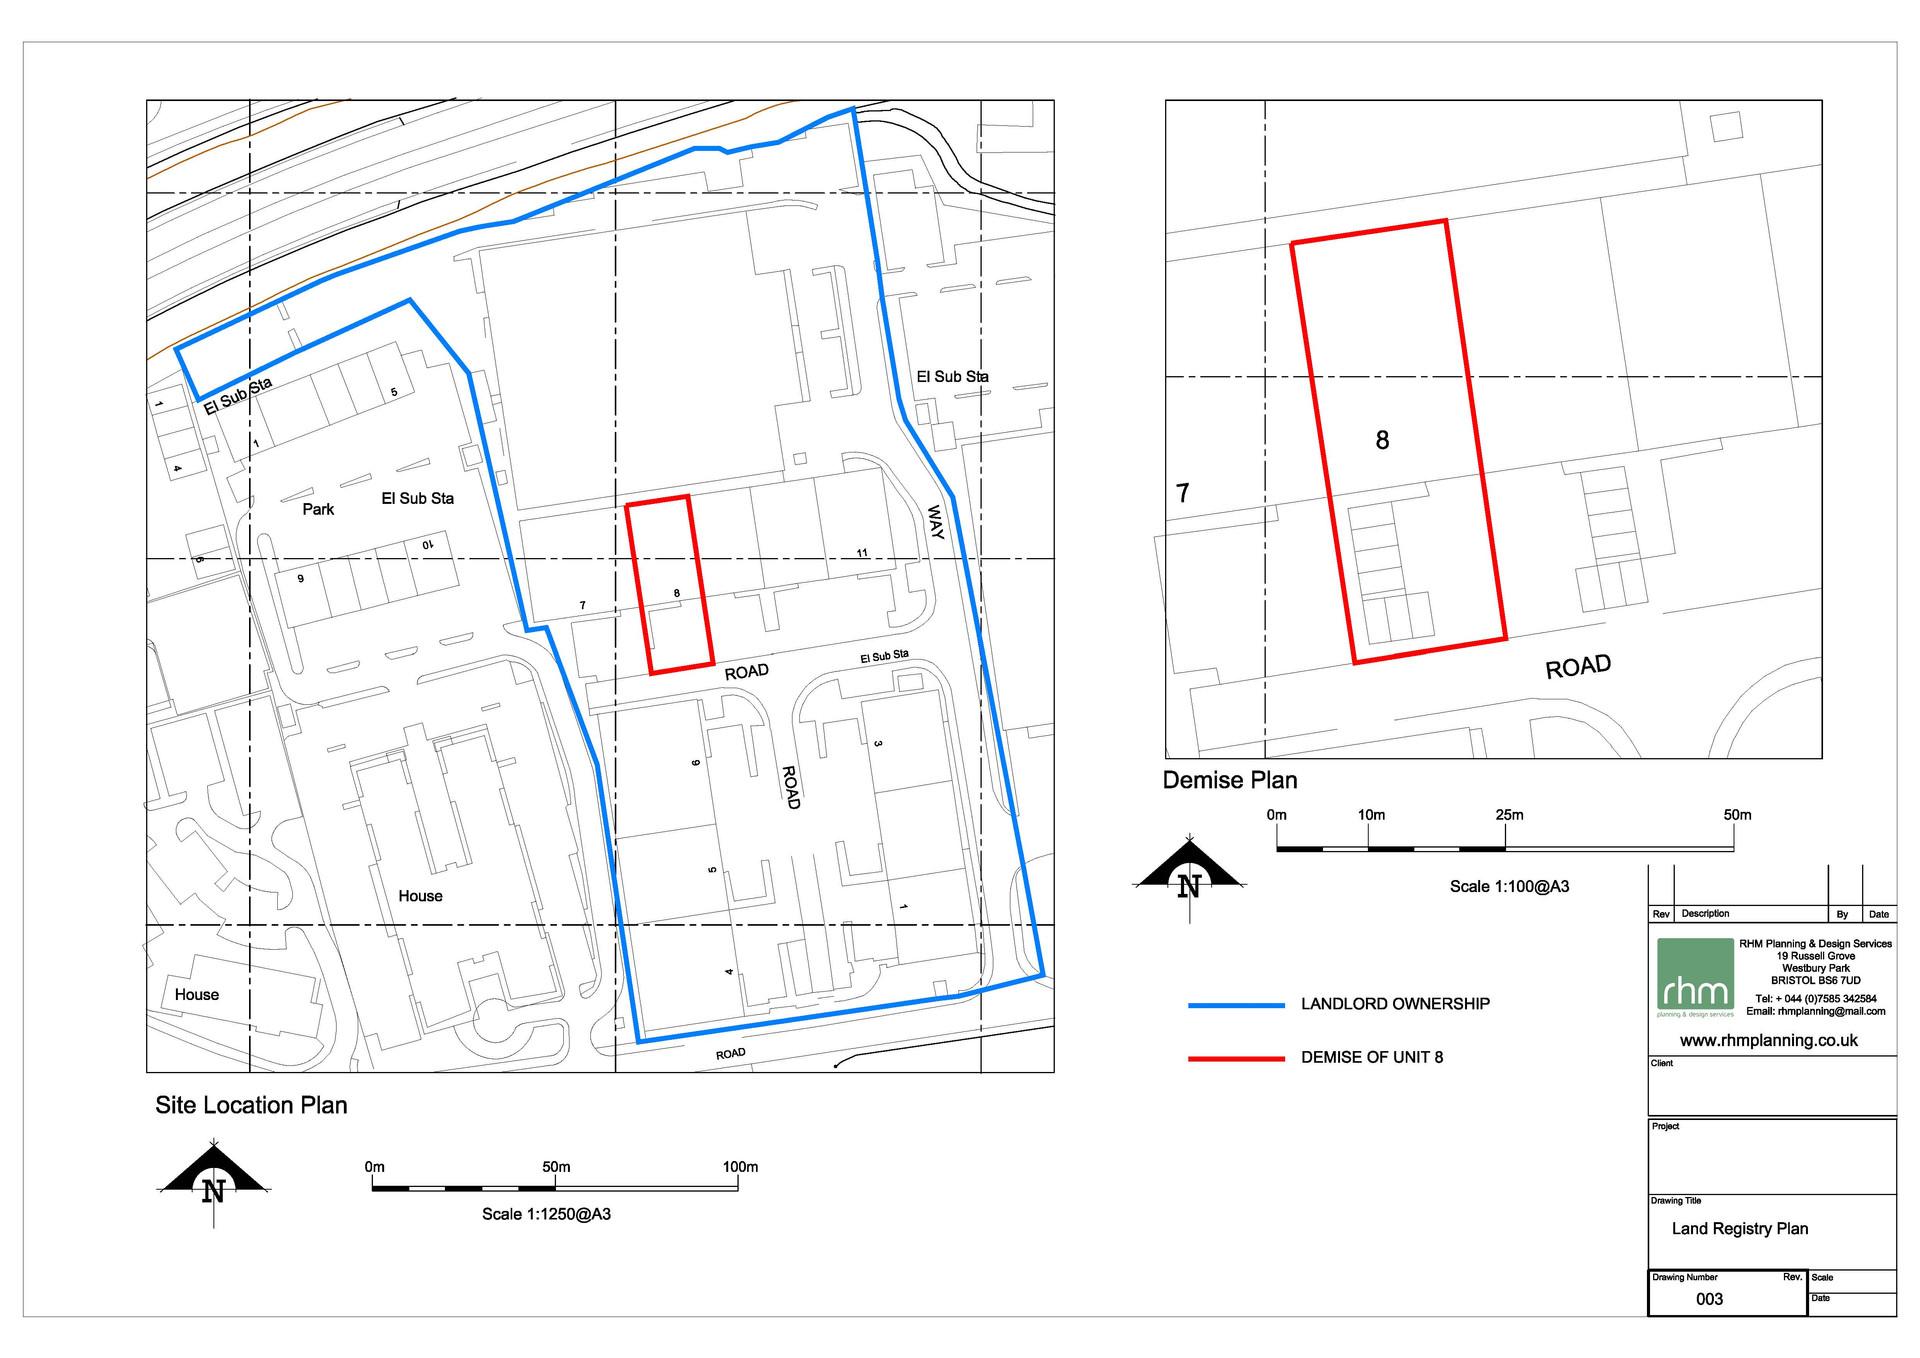 LAND REGISTRY PLAN [Example 003].jpg